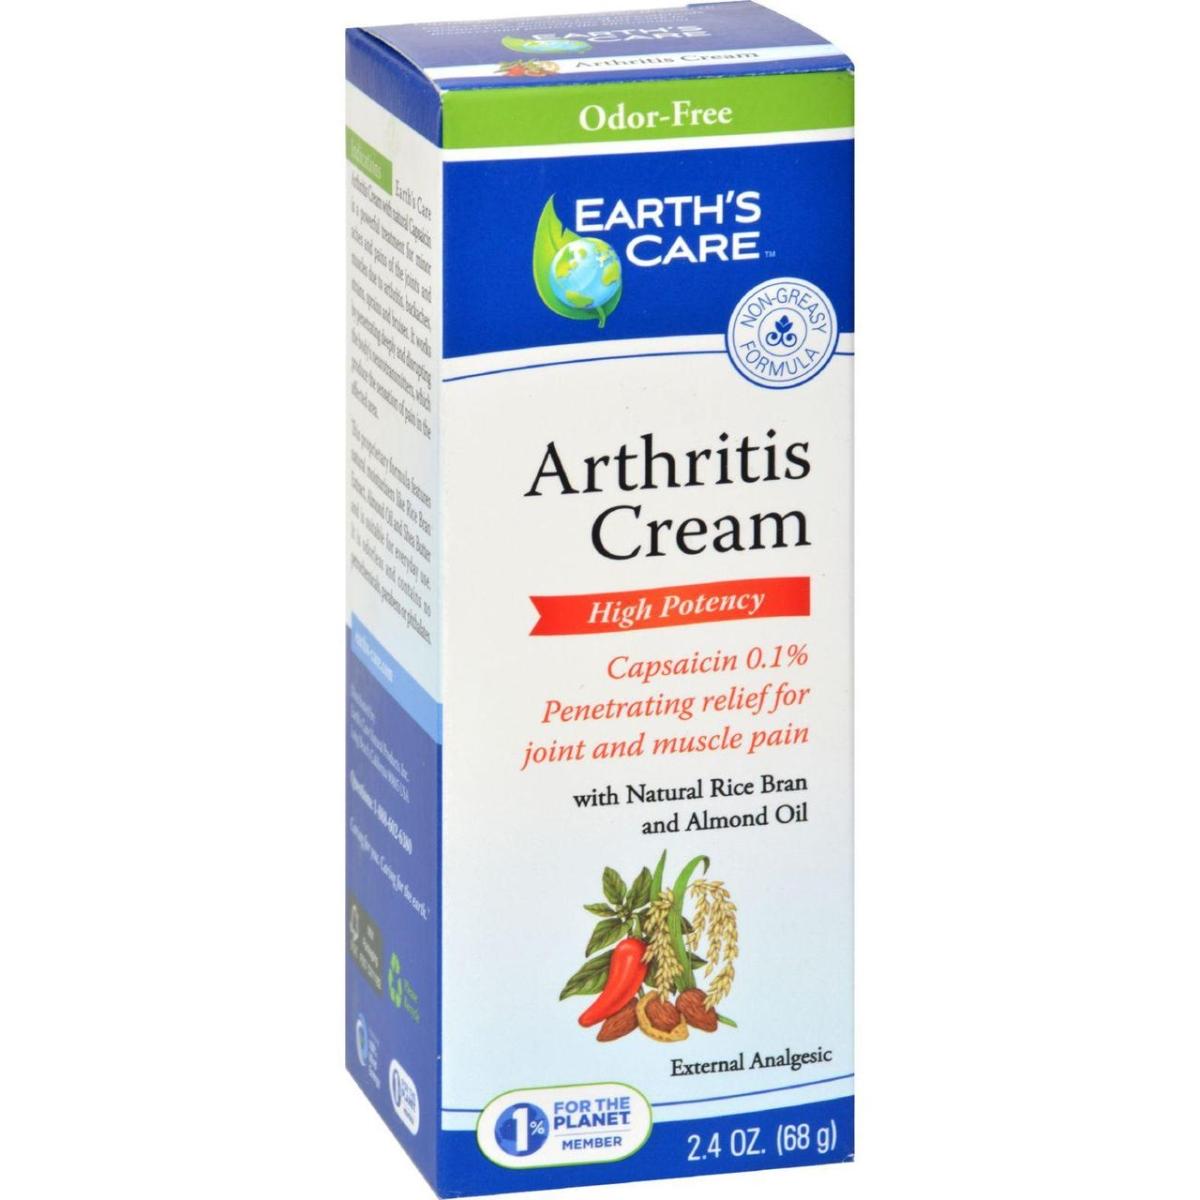 Earths Care HG1216274 2.4 oz Arthritis Cream